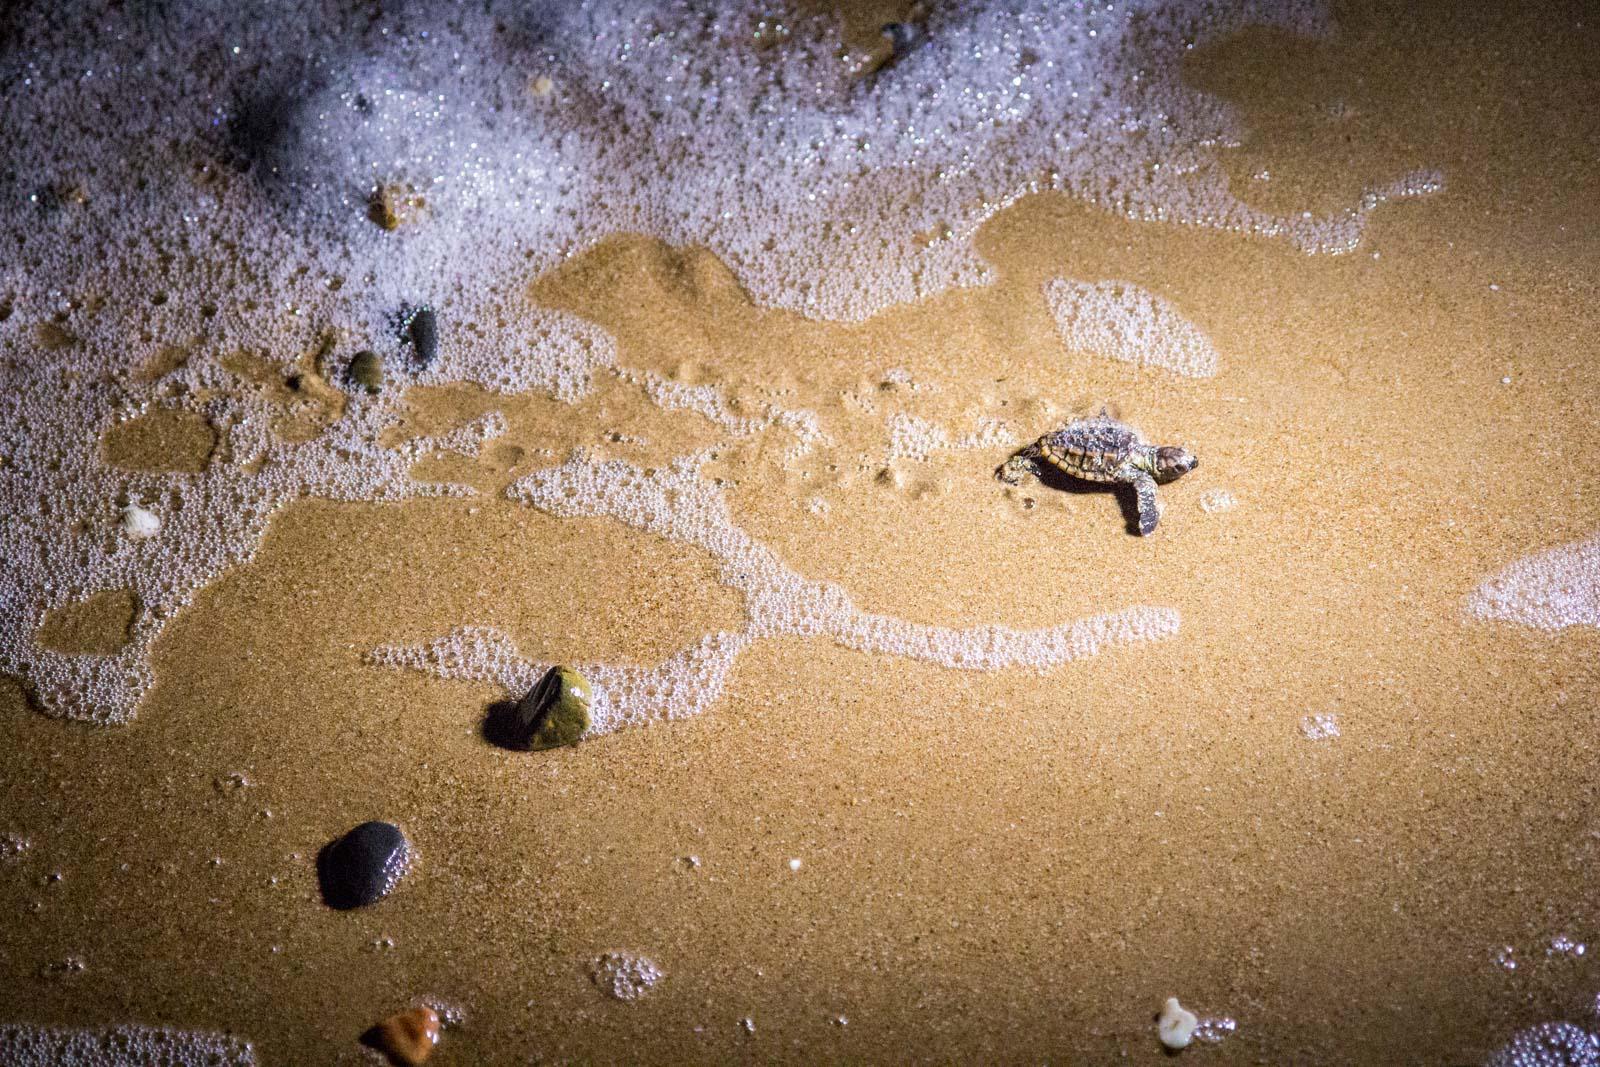 Mon Repos Turtle Rookery, Queensland, Australia